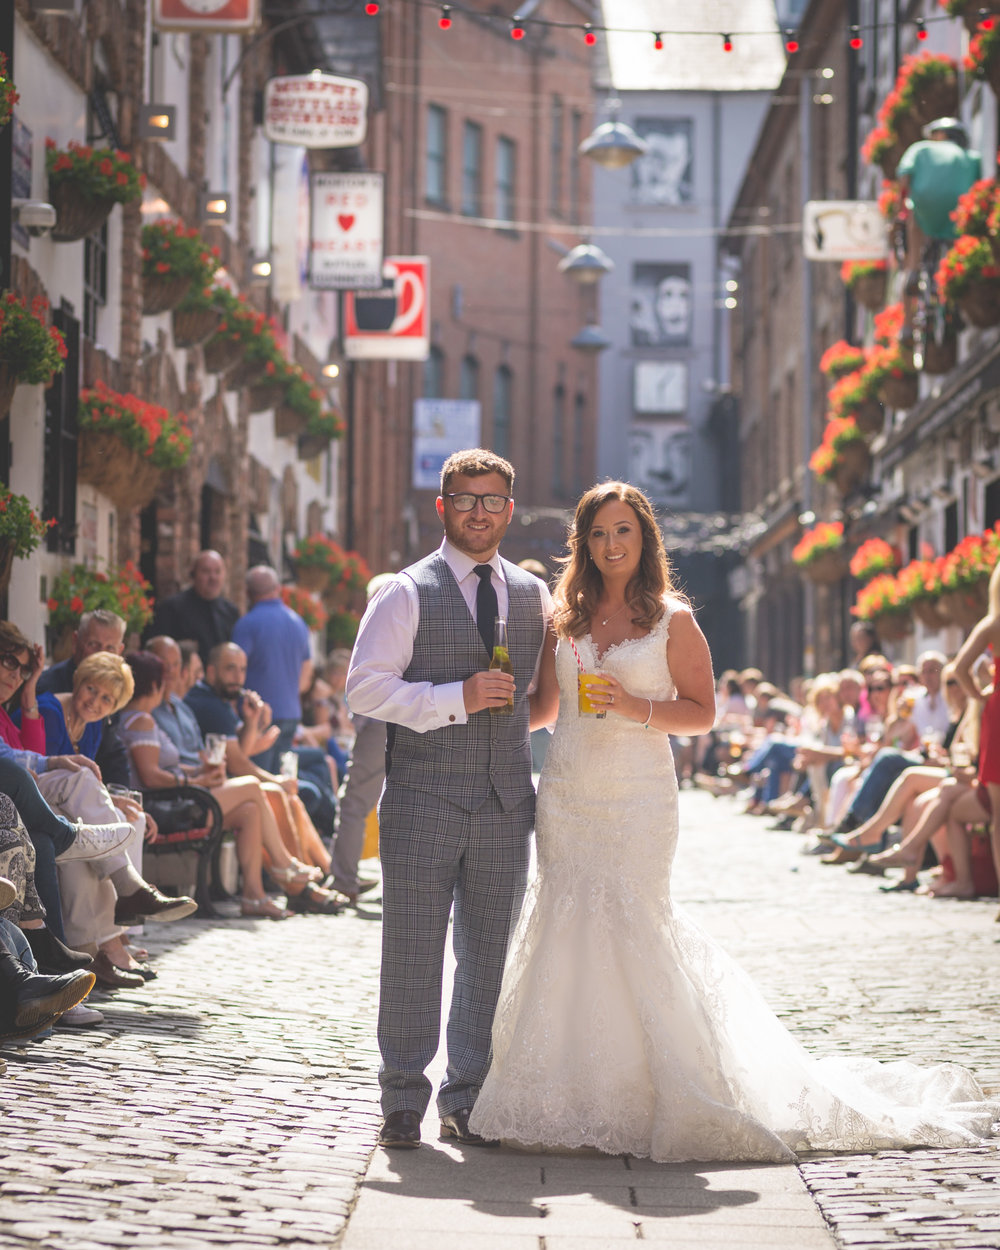 Brian McEwan | Northern Ireland Wedding Photographer | Rebecca & Michael | Portraits-106.jpg